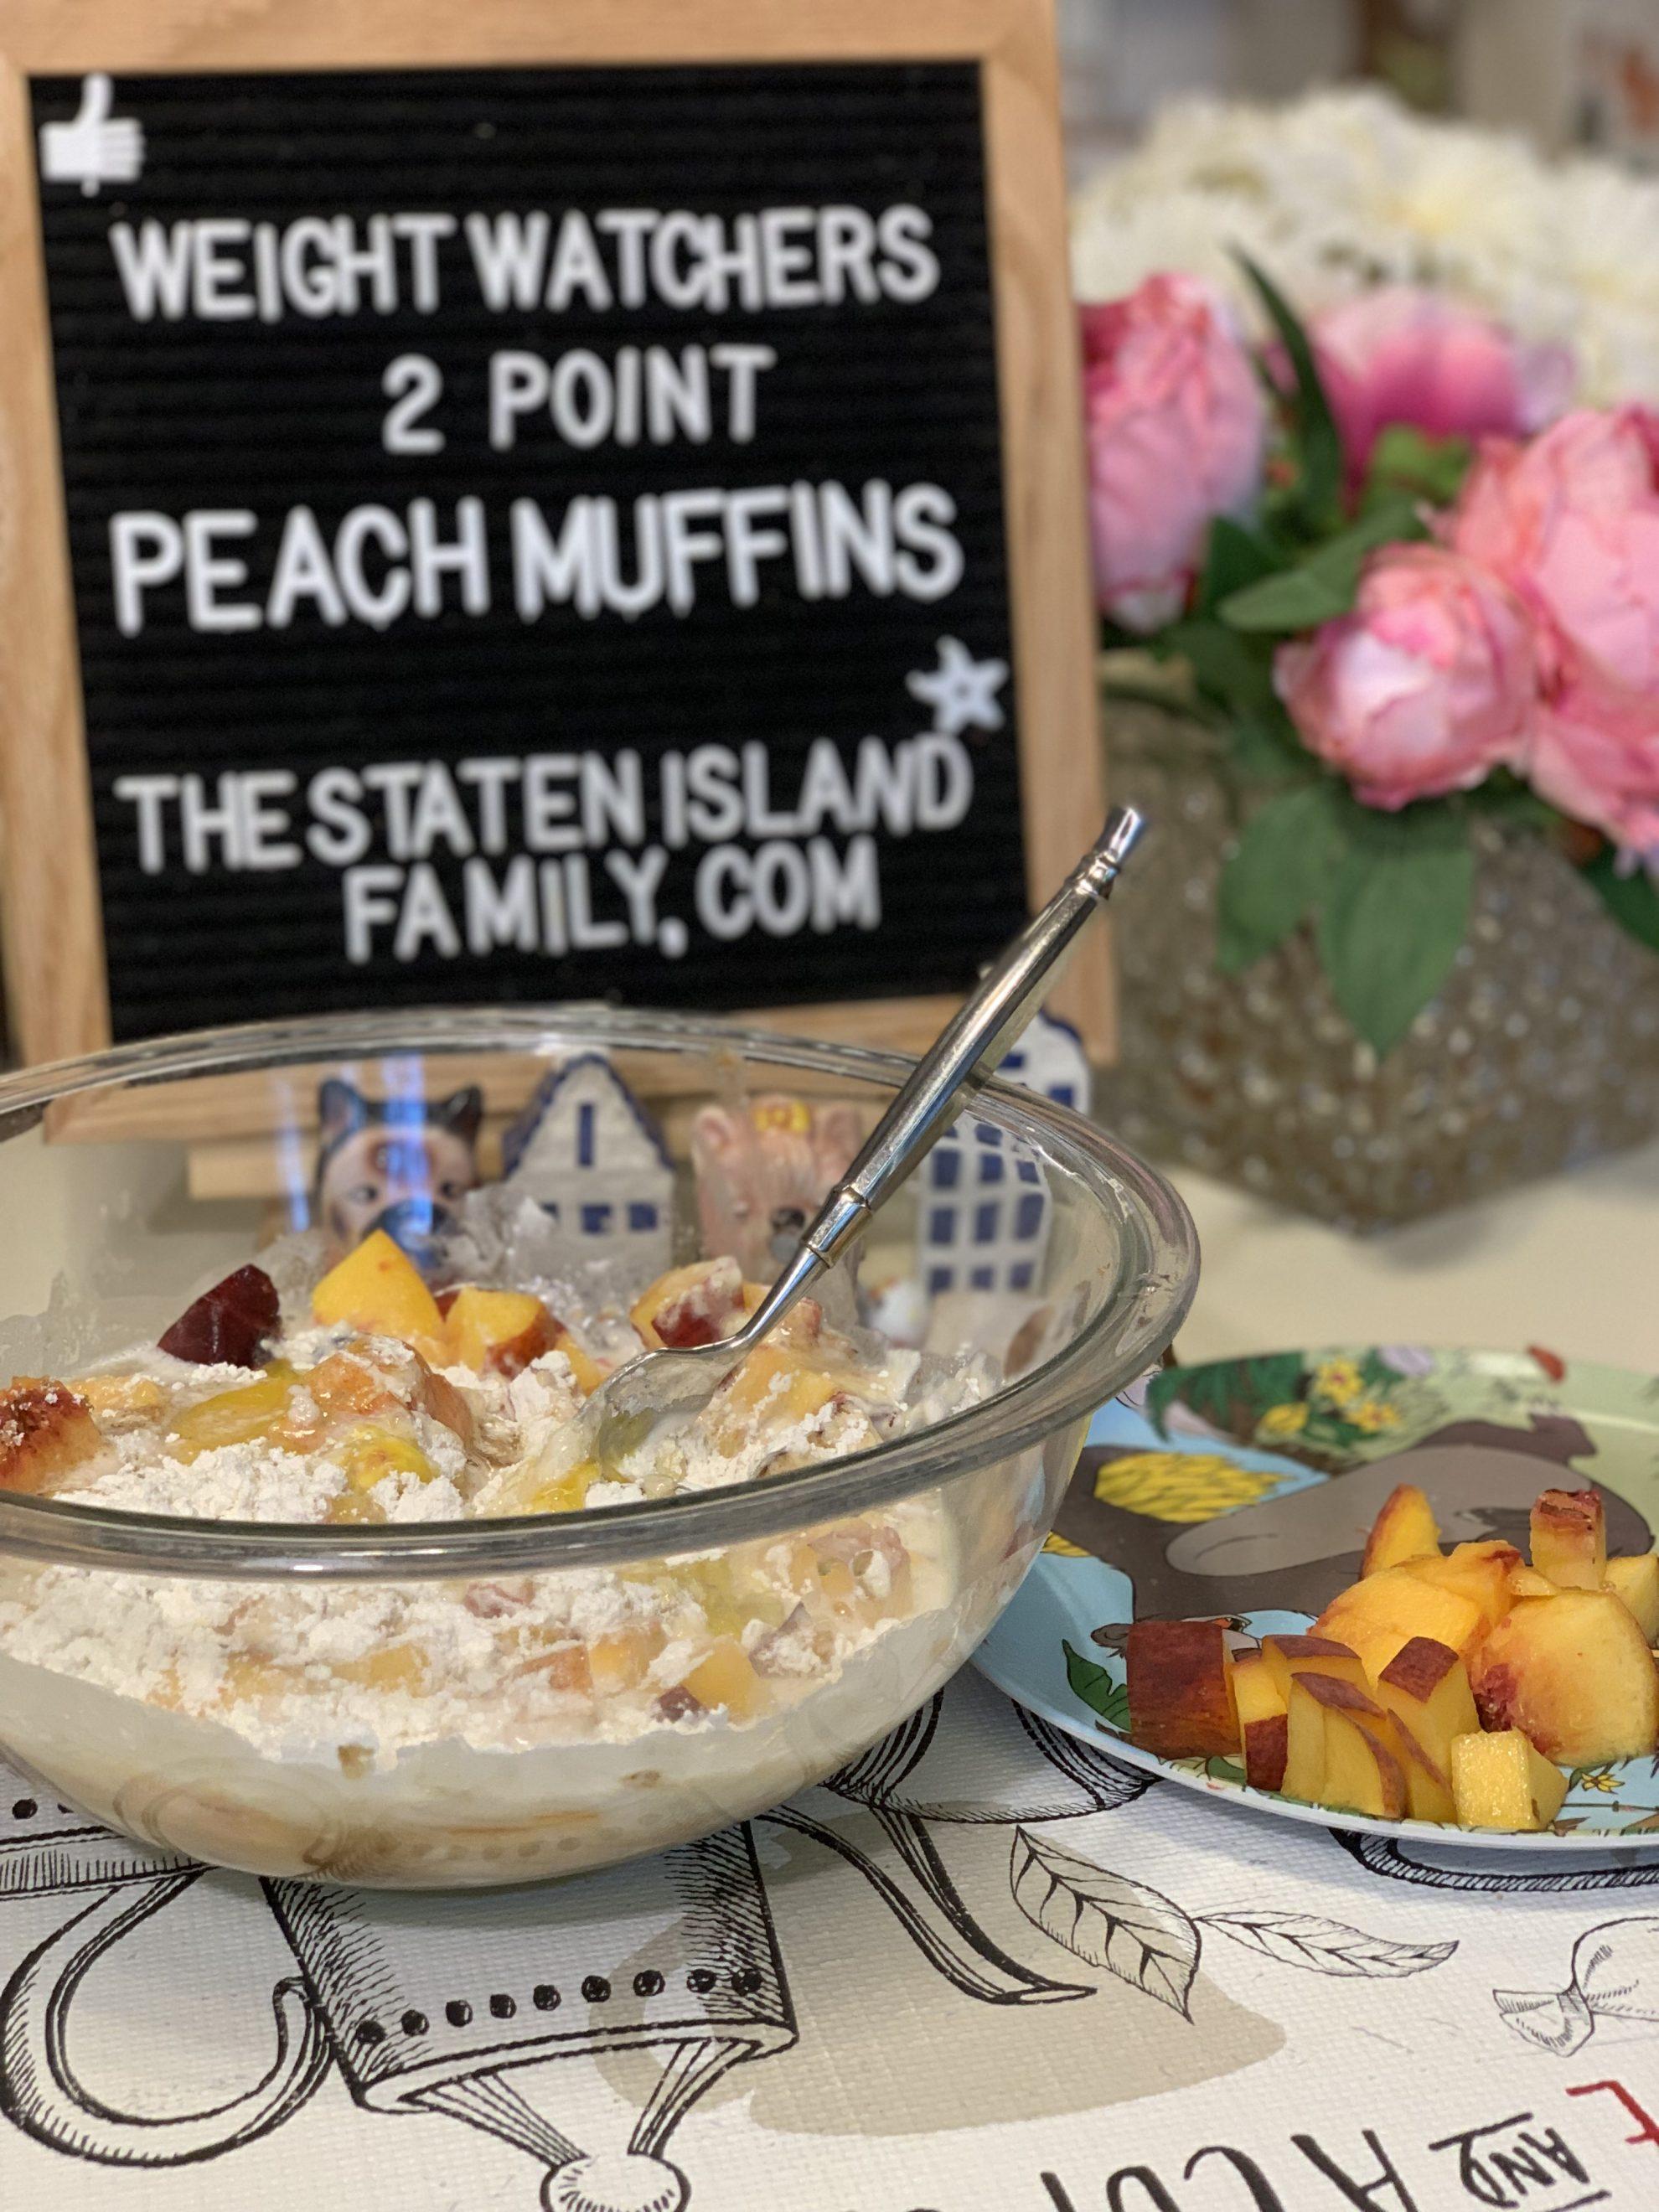 Weight Watchers Peach Muffins Recipe